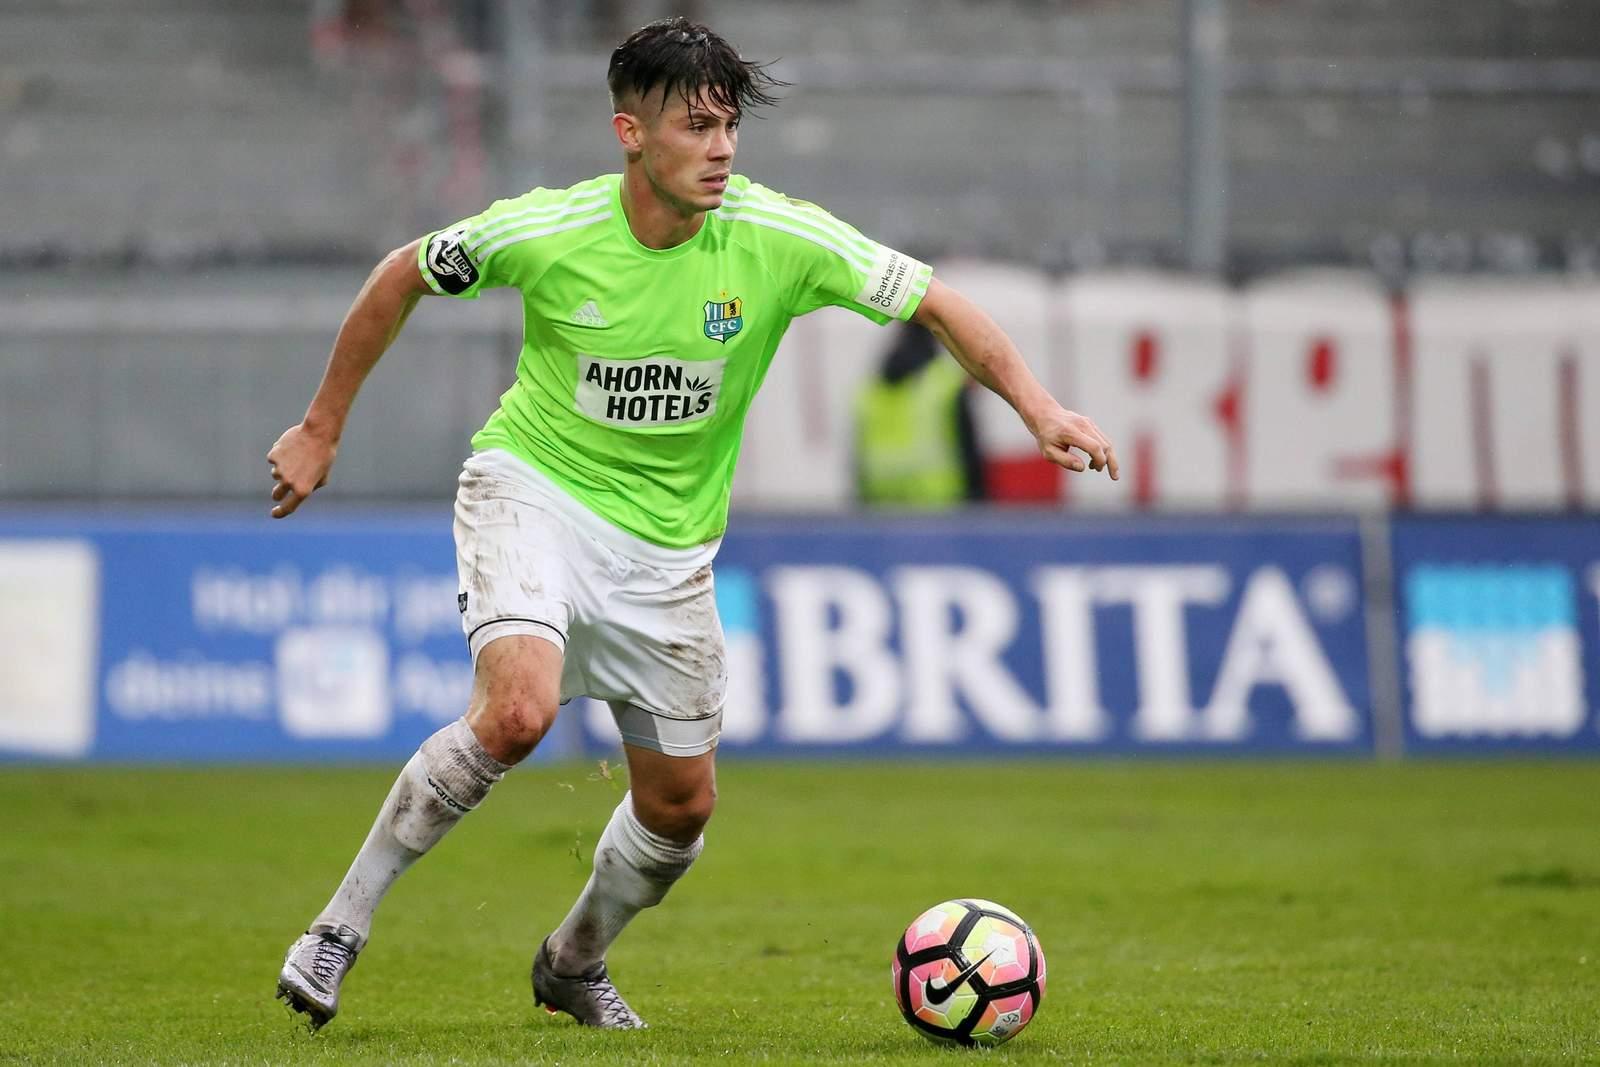 Dennis Mast vom Chemnitzer FC.